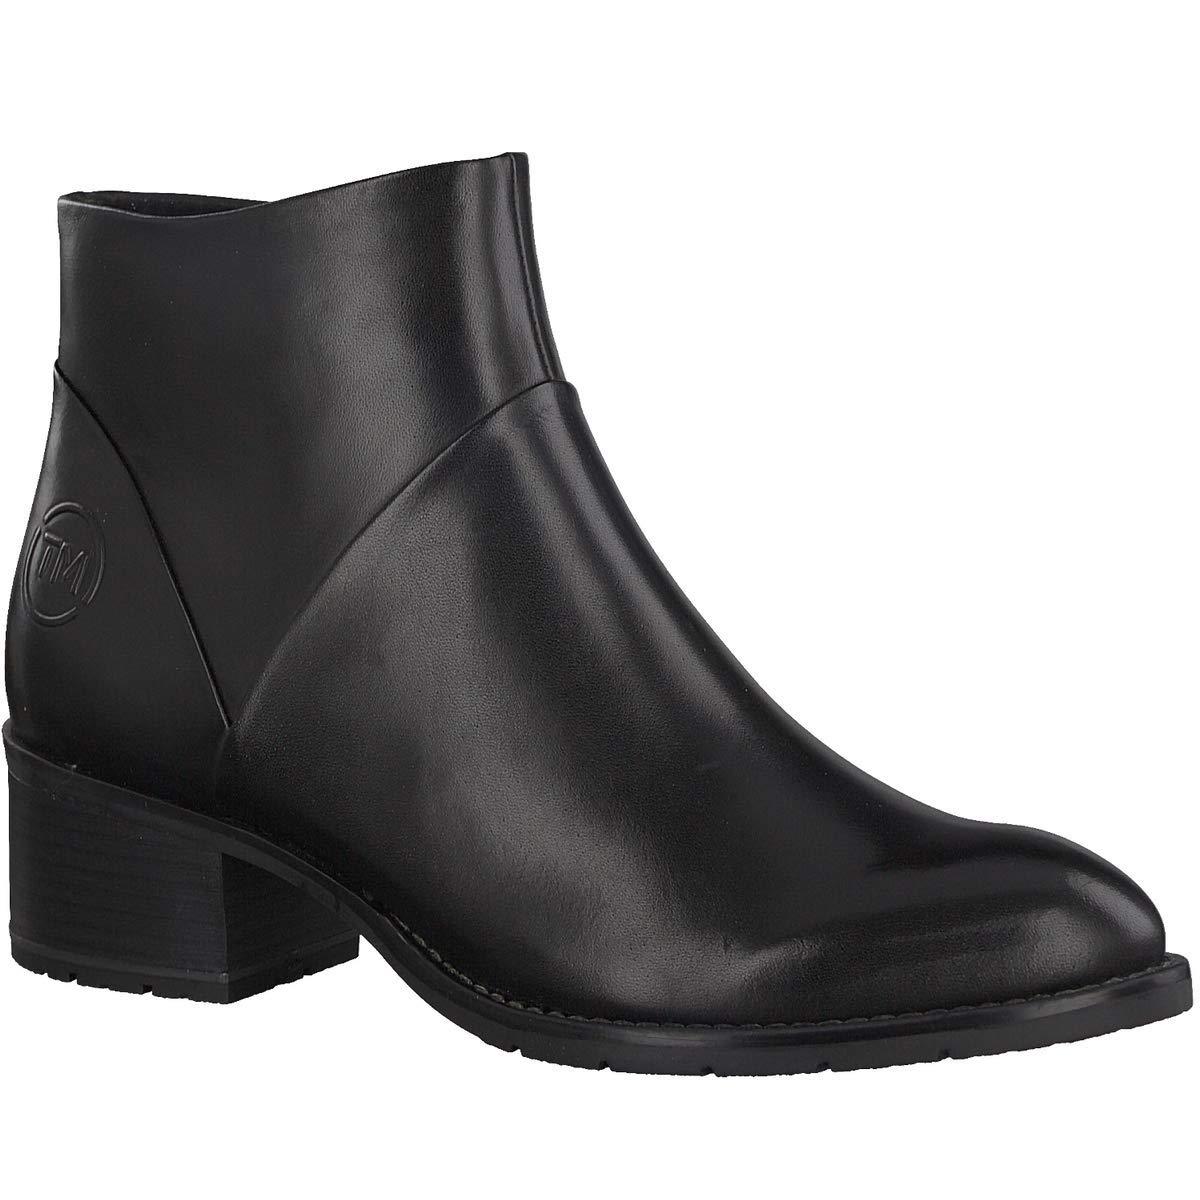 MARCO TOZZI Damen Stiefeletten Woms Stiefel 2-2-25334-21 002 schwarz 522980